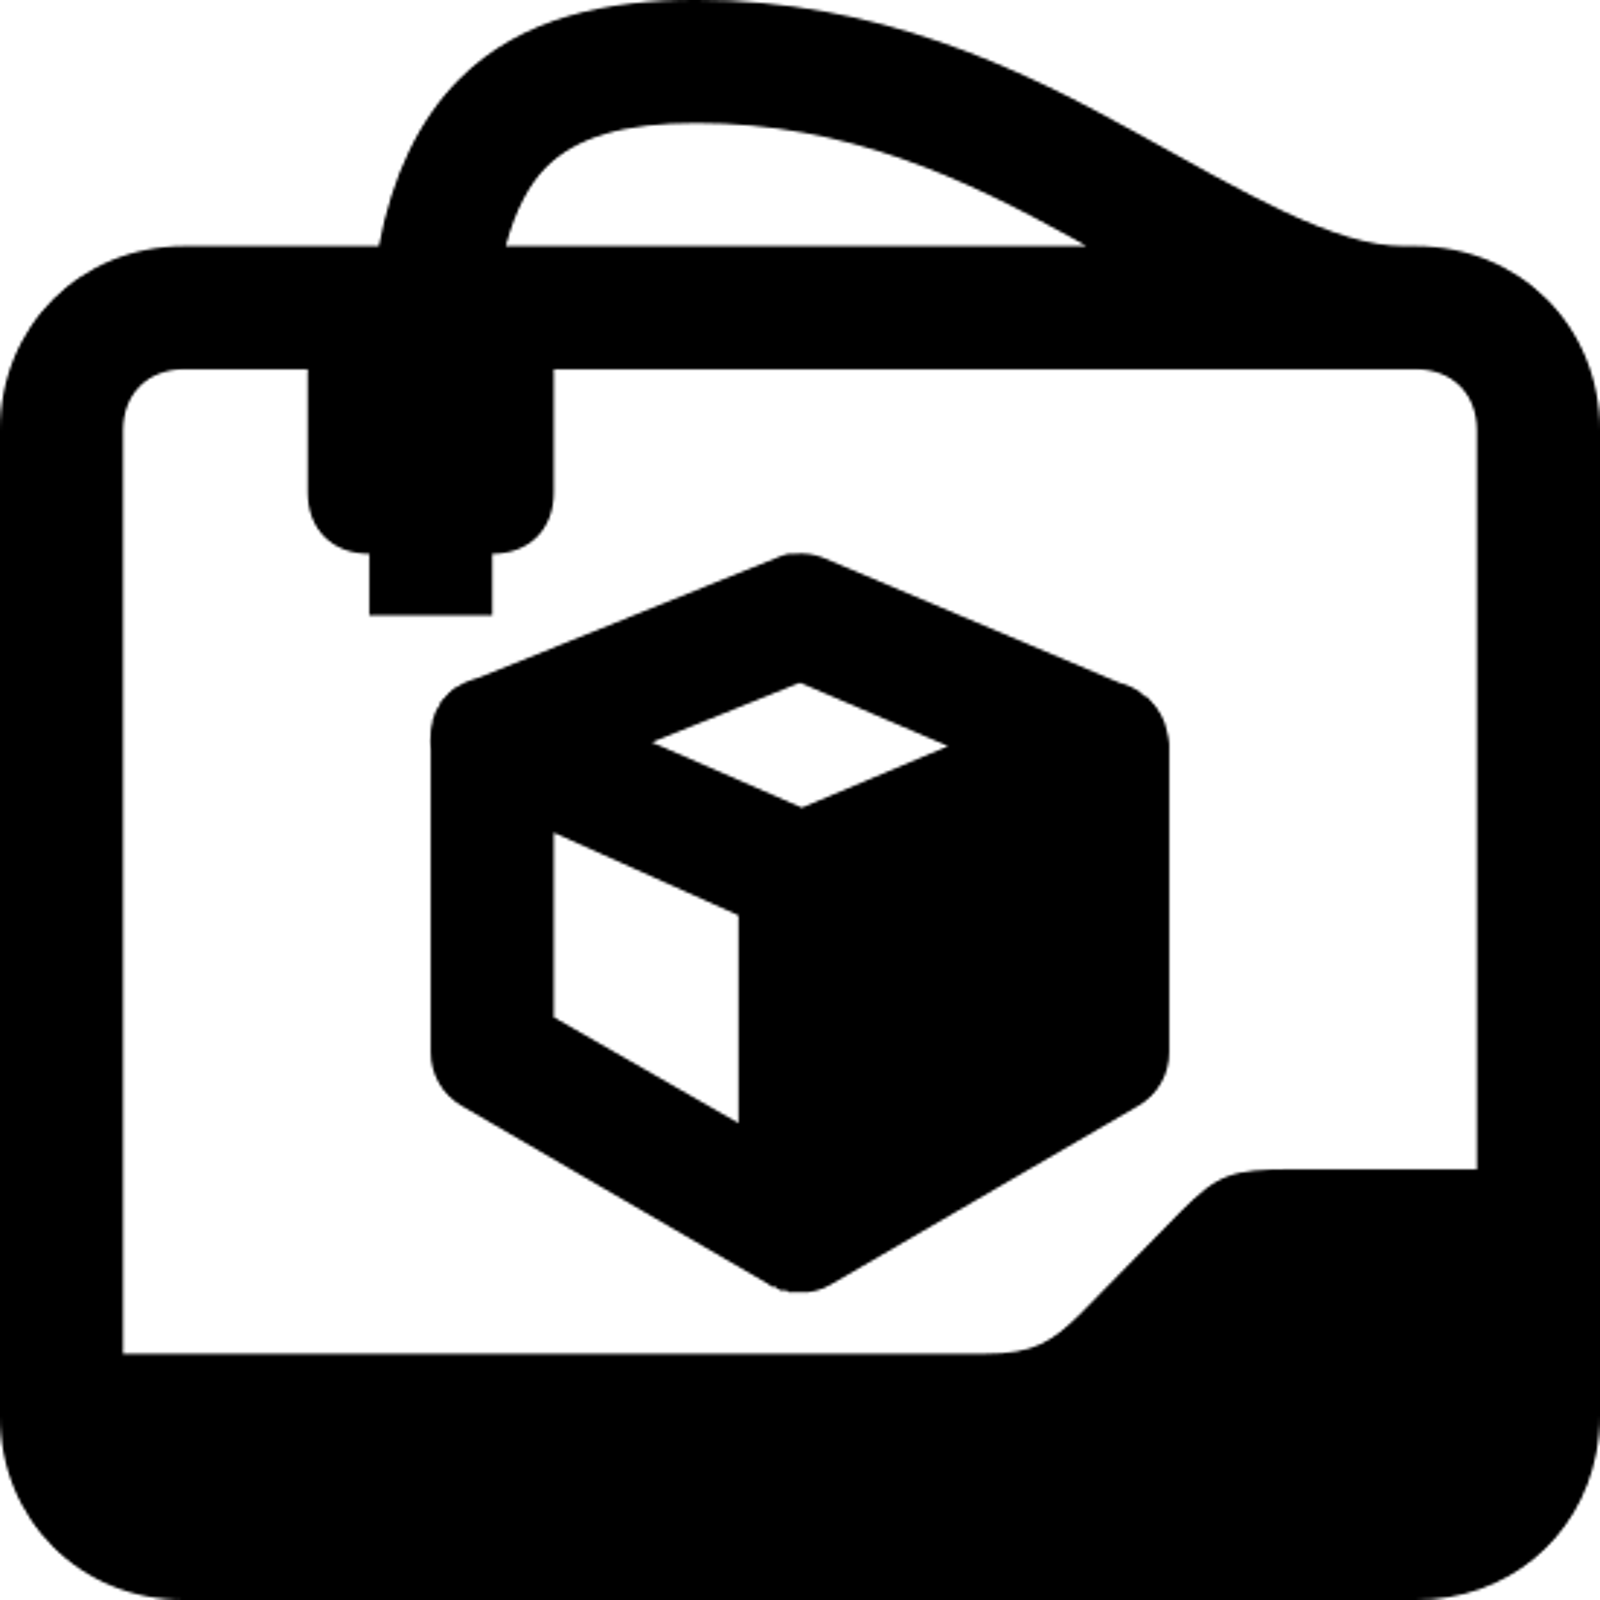 Impressora 3D icon